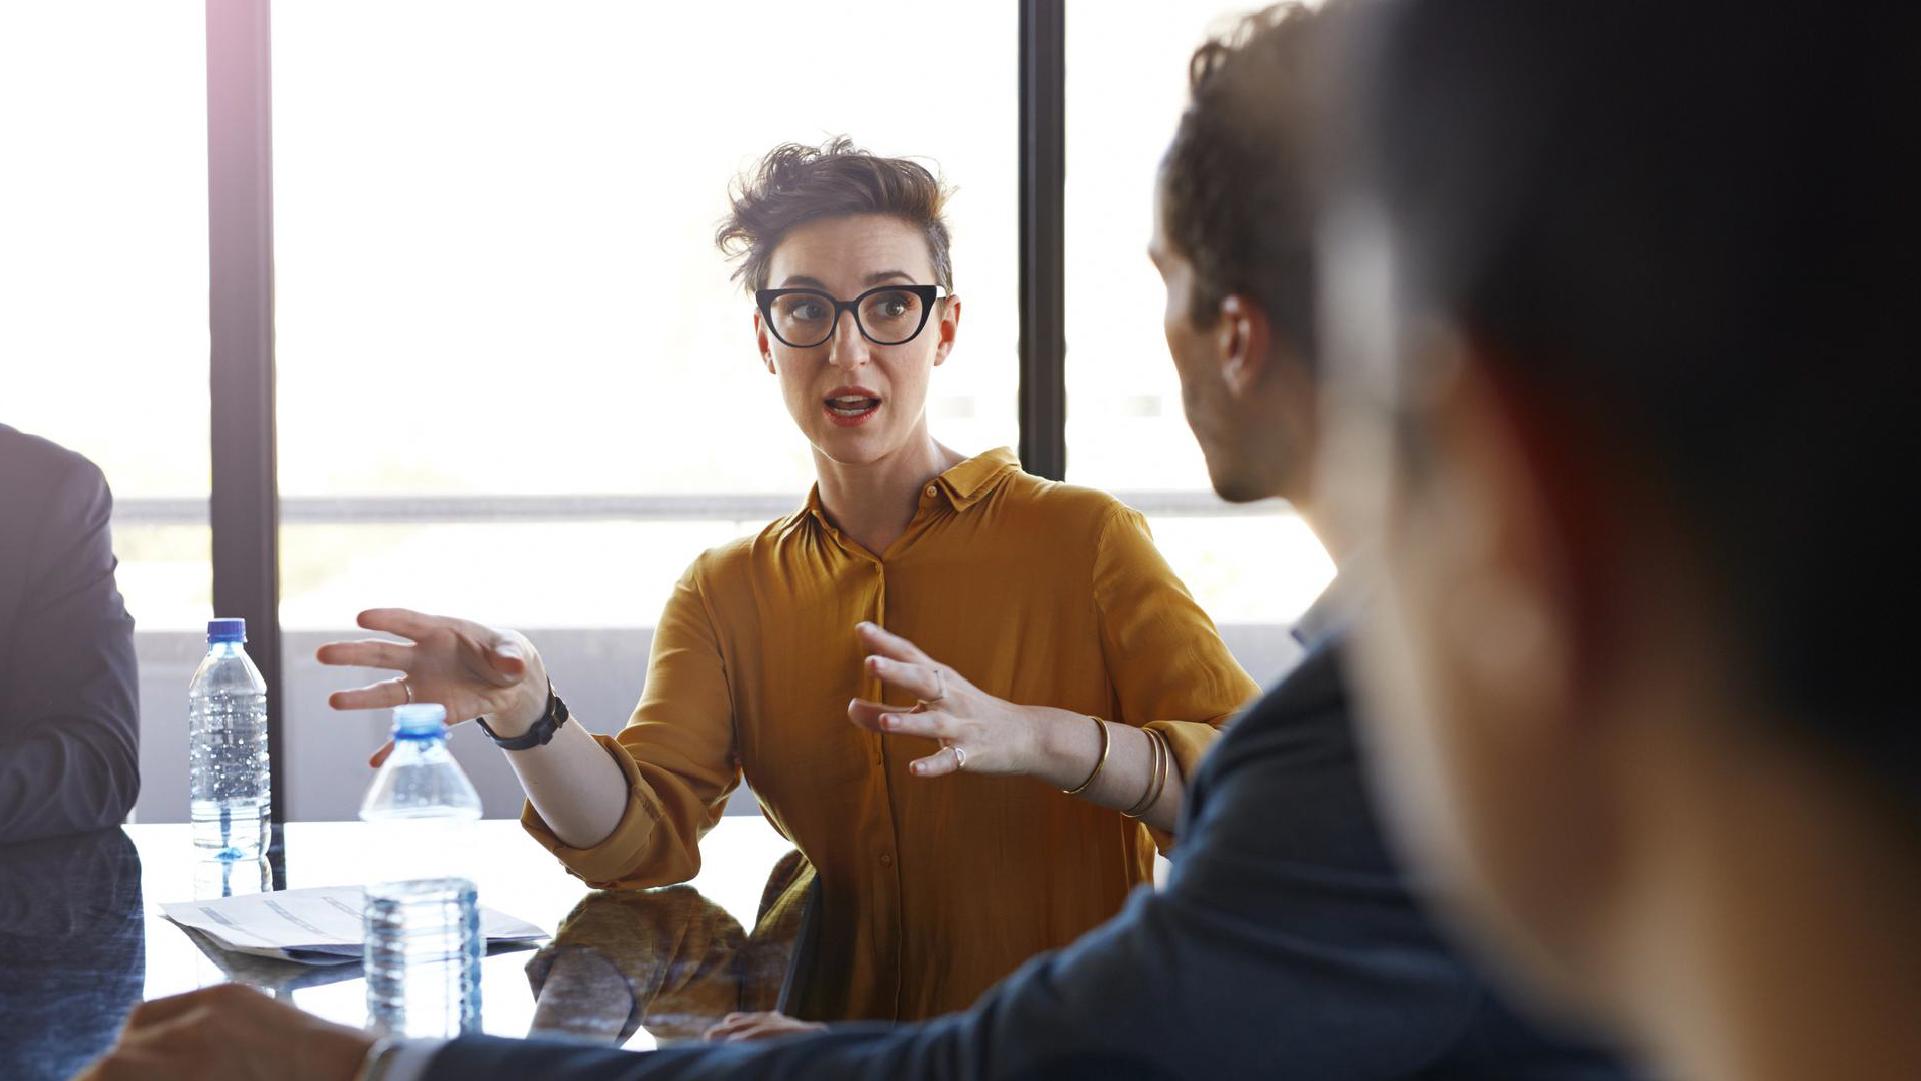 Twenty–five companiesthat use psychometric testing for hiring